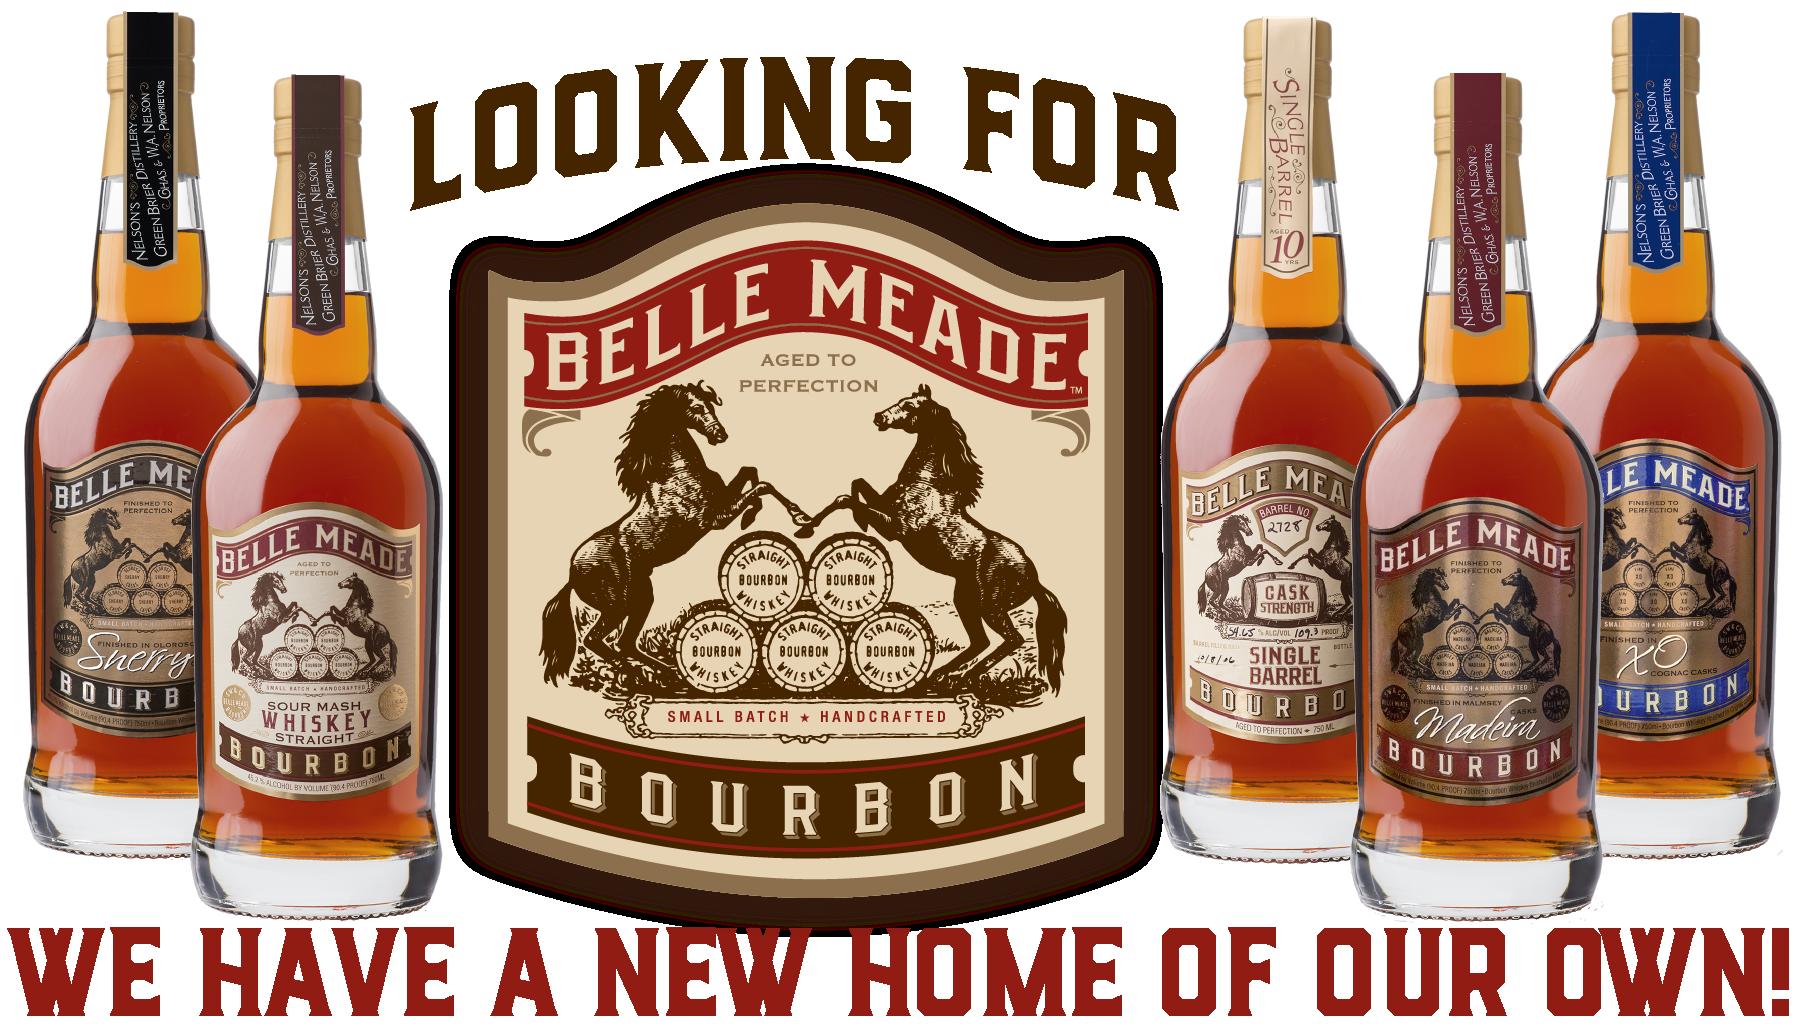 Belle Meade Bourbon-01.png